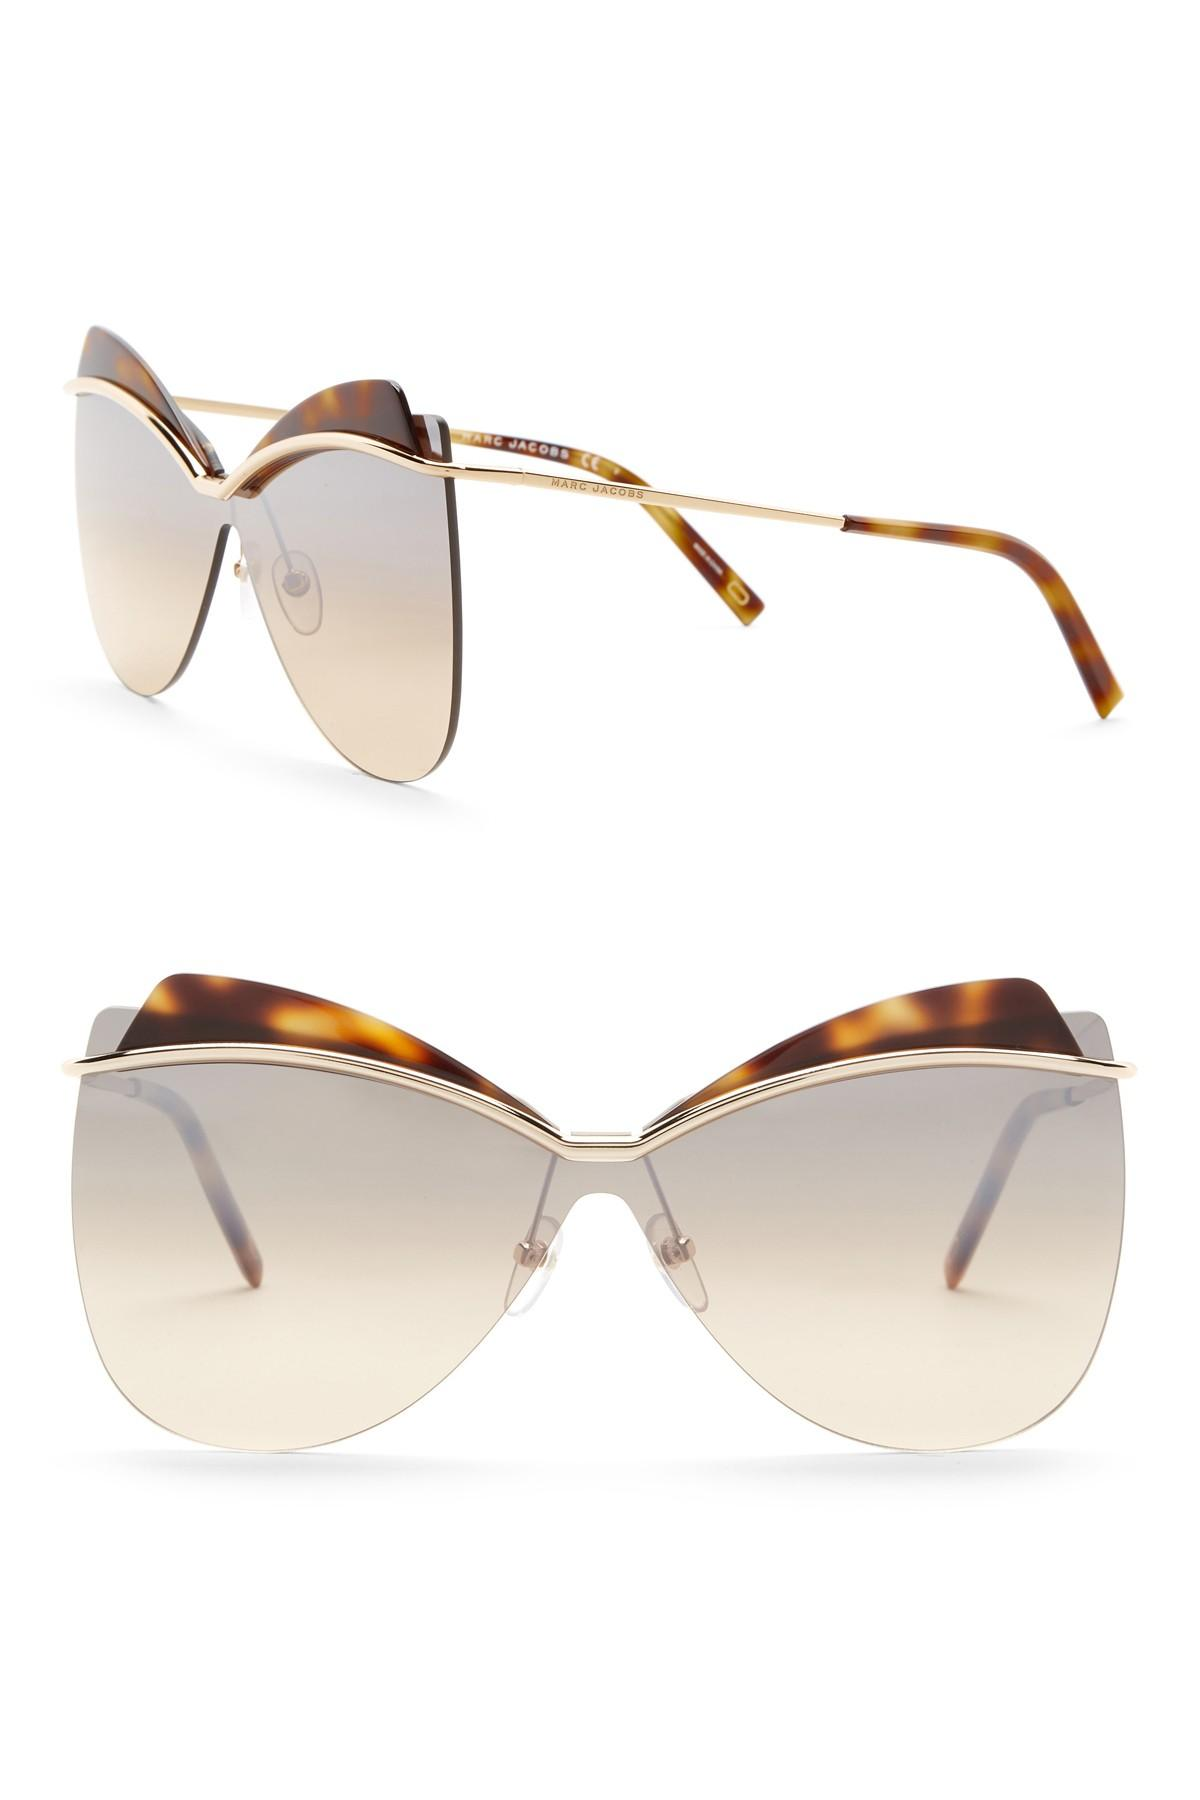 Marc Jacobs 73mm Cat Eye Sunglasses